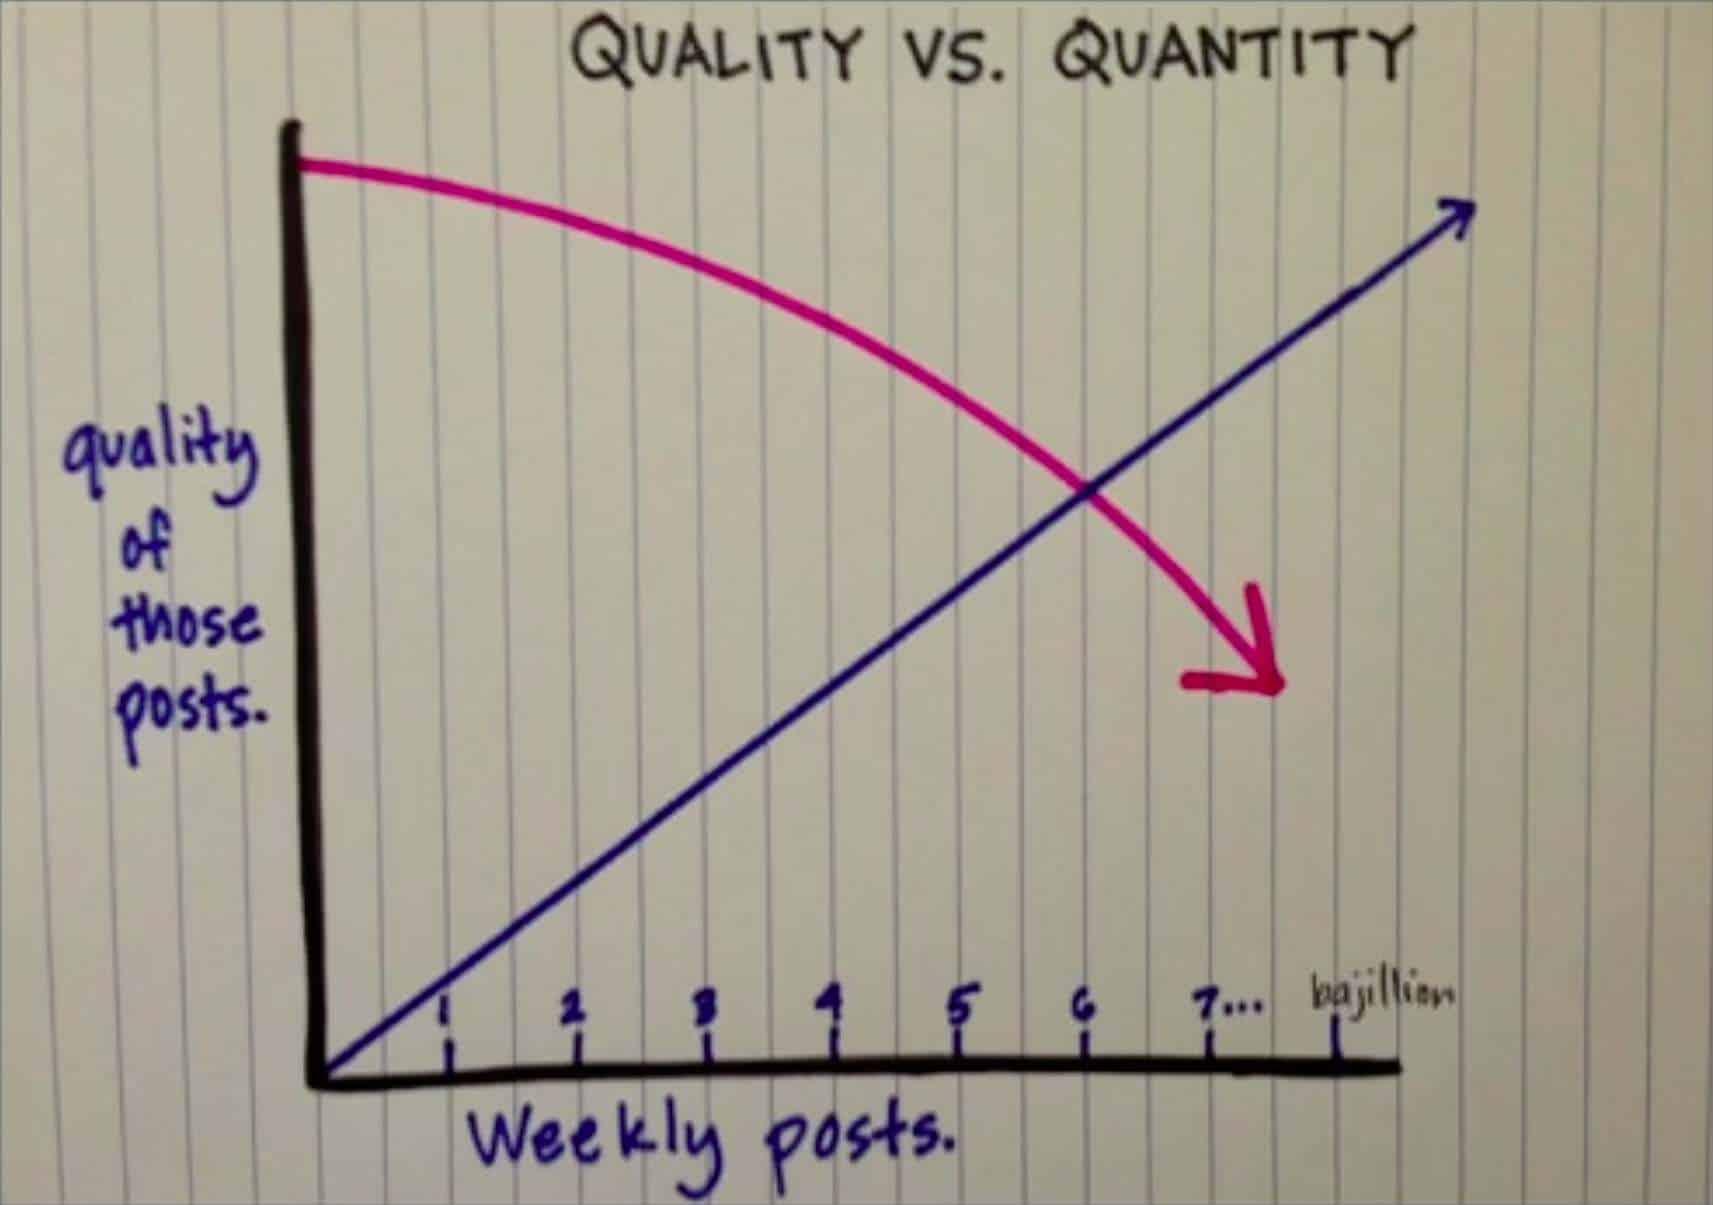 Kvalitet og kvantitet